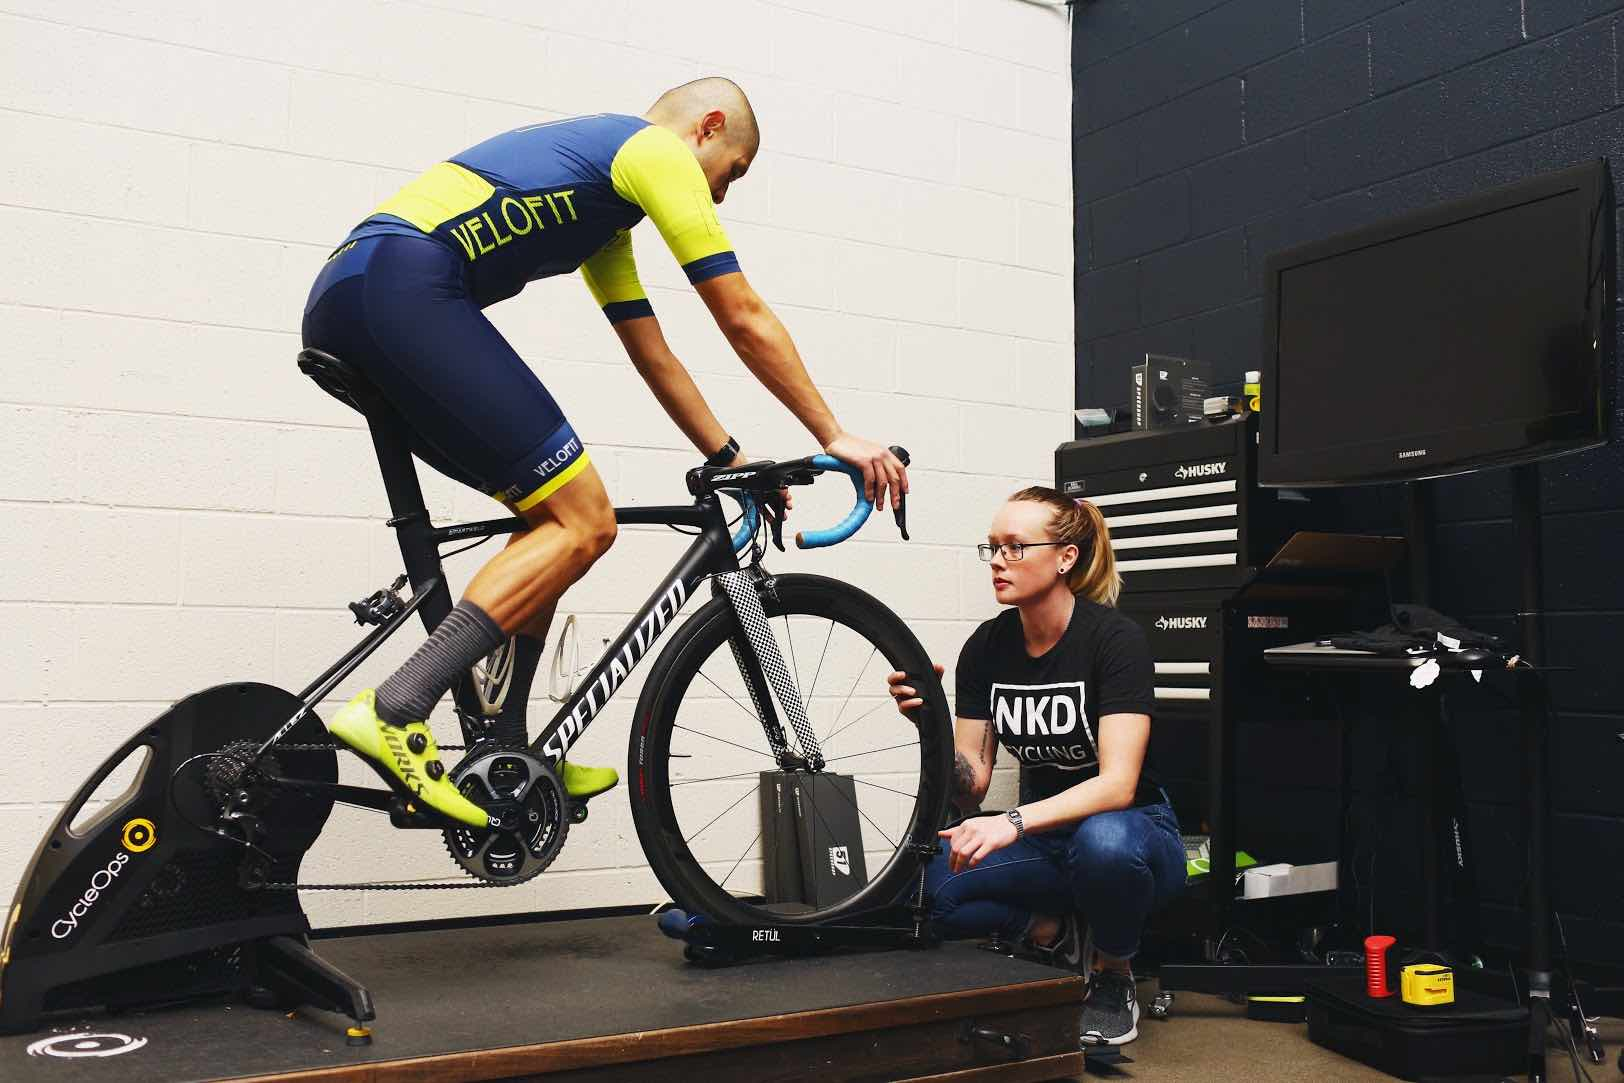 Matt Wilpers Bike Fitting Service - NYC